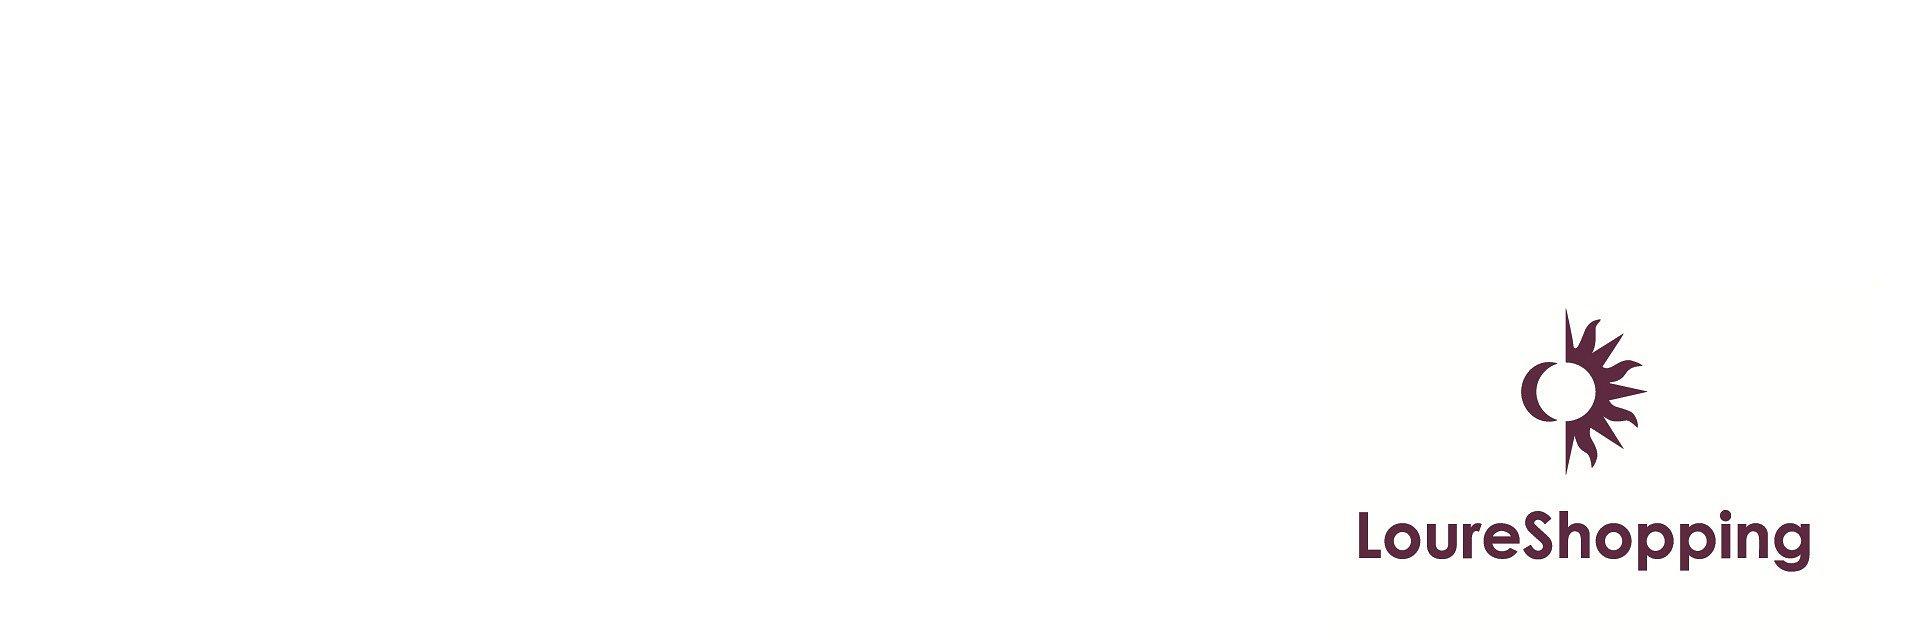 Encontre o colar de Bastet no LoureShopping